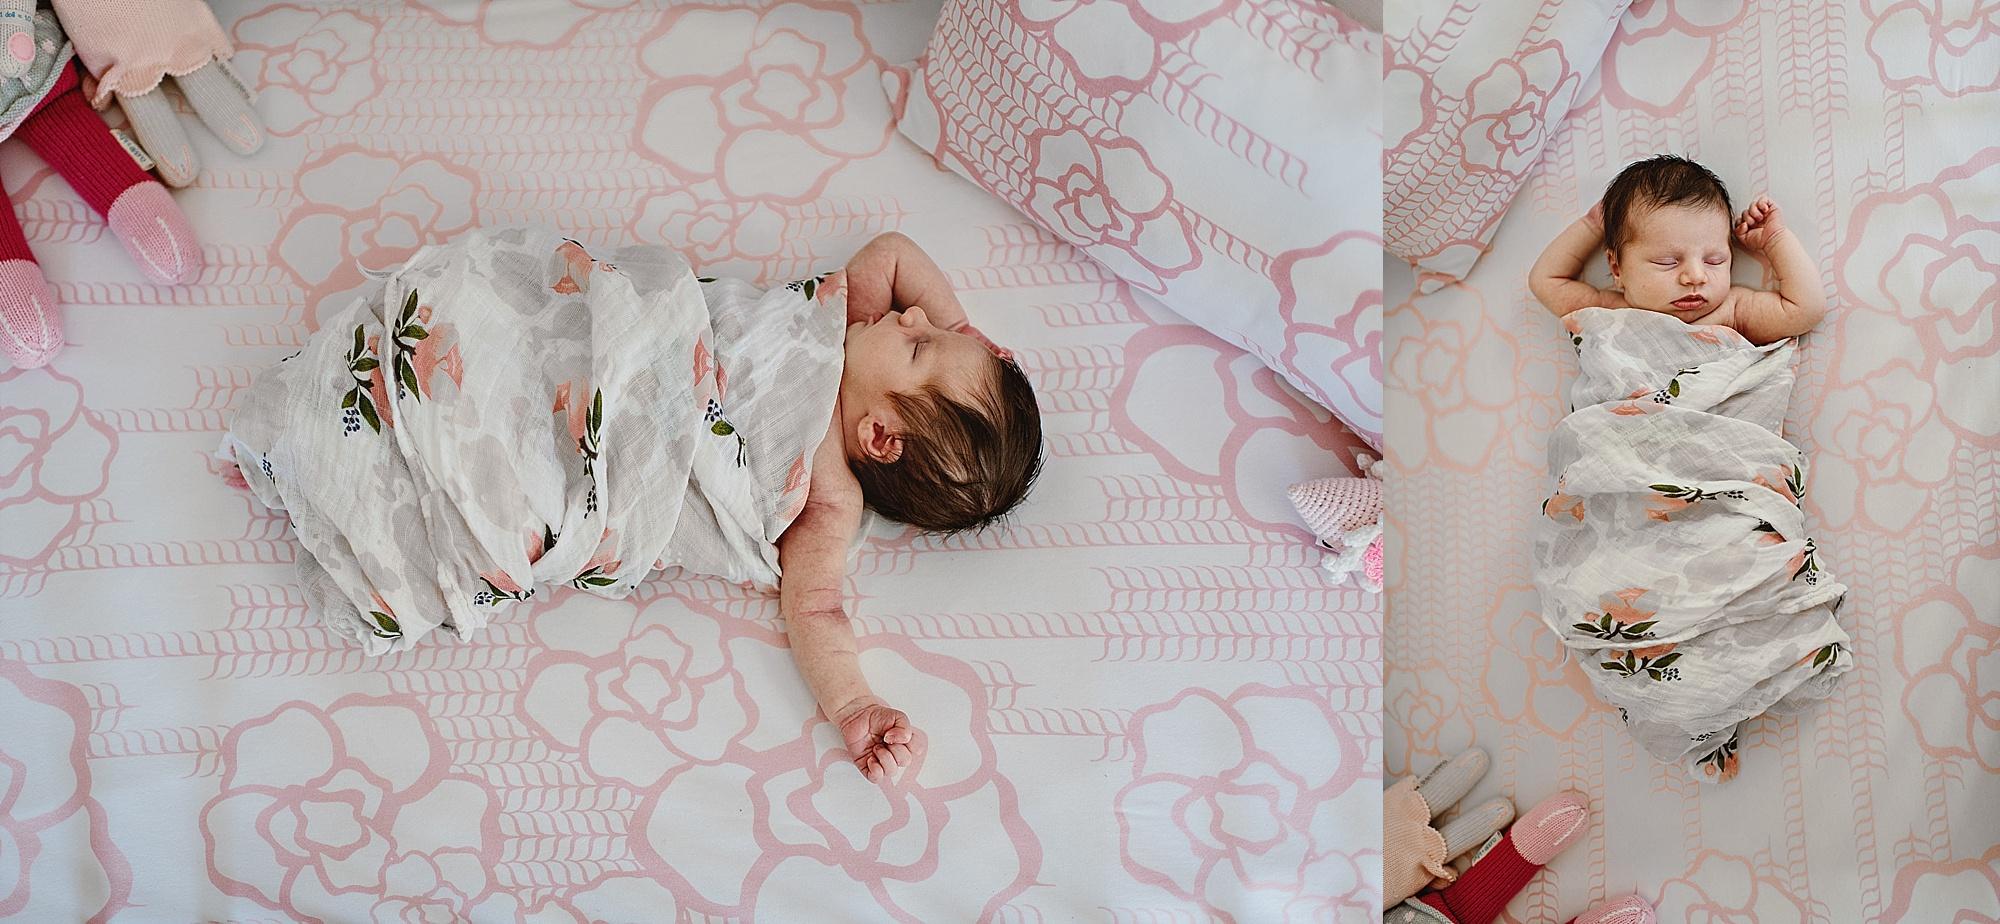 lauren-grayson-photography-cleveland-ohio-photographer-newborn-session-in-home-lifestyle-newborn-family-vivian_0654.jpg